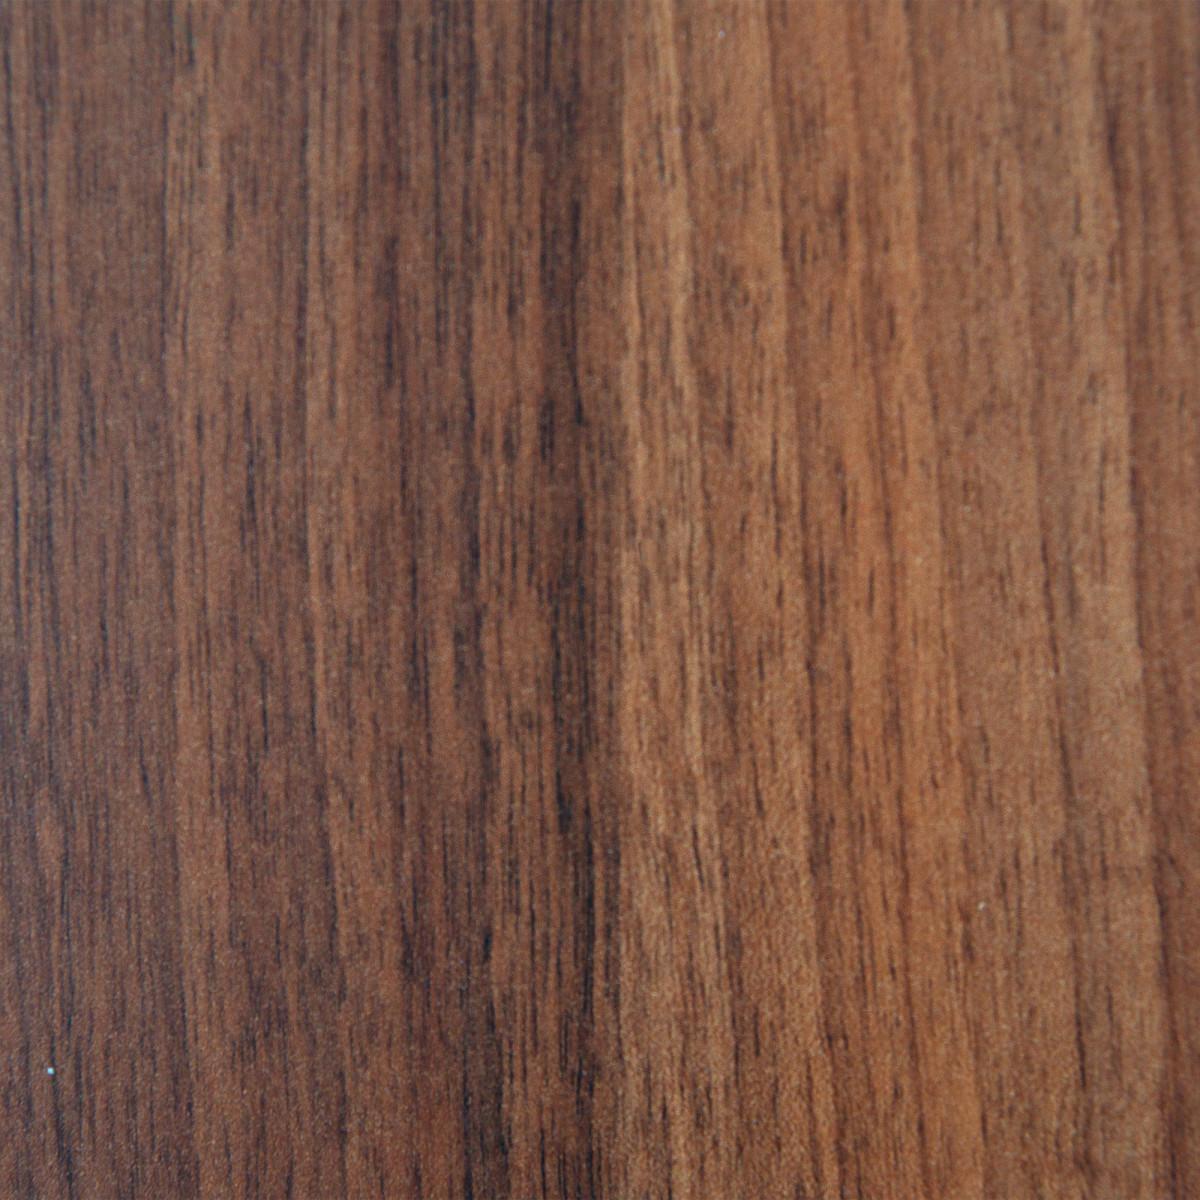 Деталь мебельная 1200x300x16 мм ЛДСП цвет орех антик кромка со всех сторон